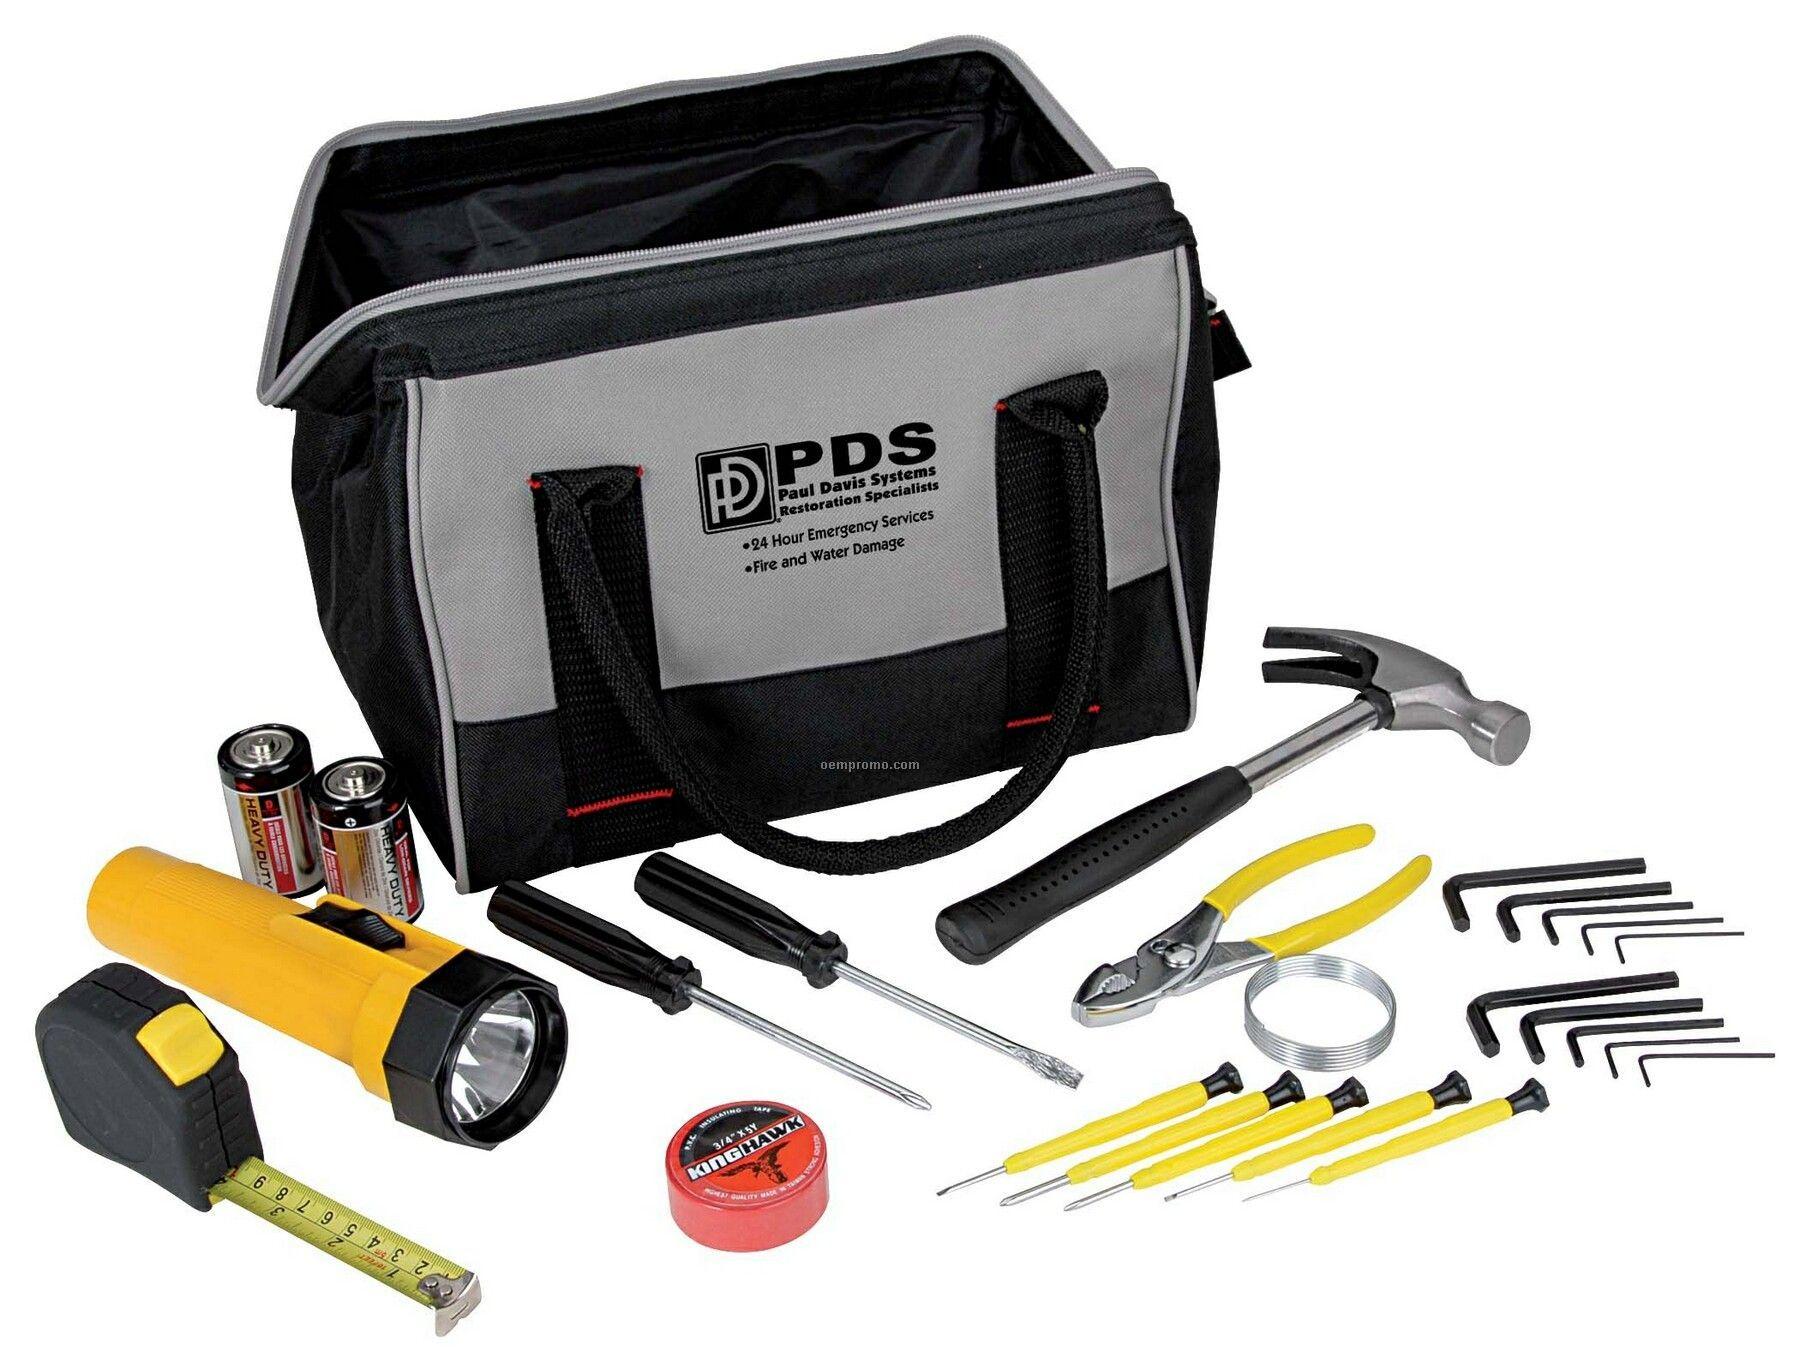 V-line Deluxe Paragon Tool Kit